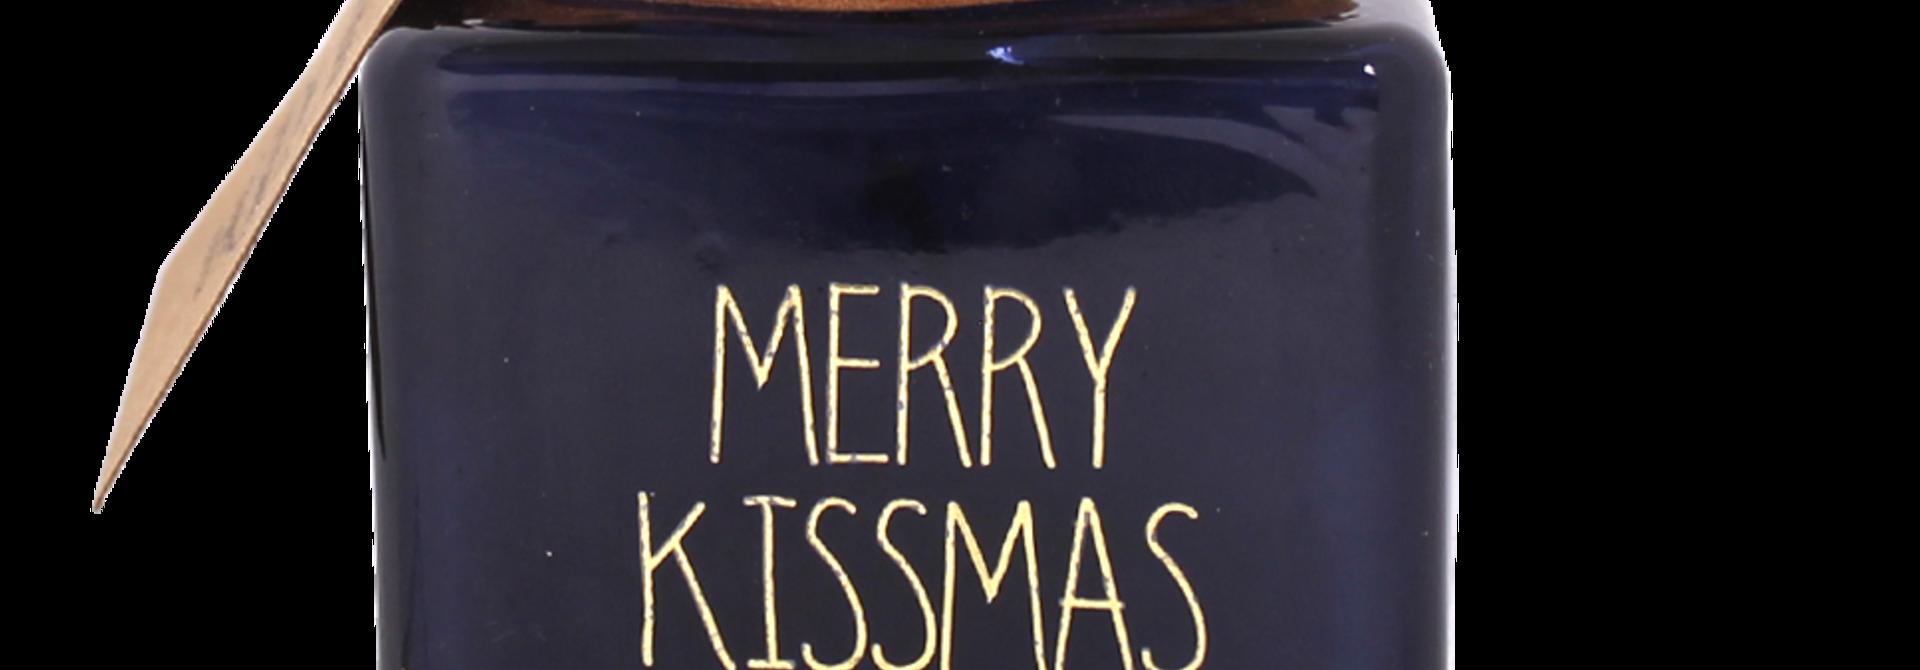 Bio  Sojakaars - MERRY KISSMAS - Geur Winter Glow